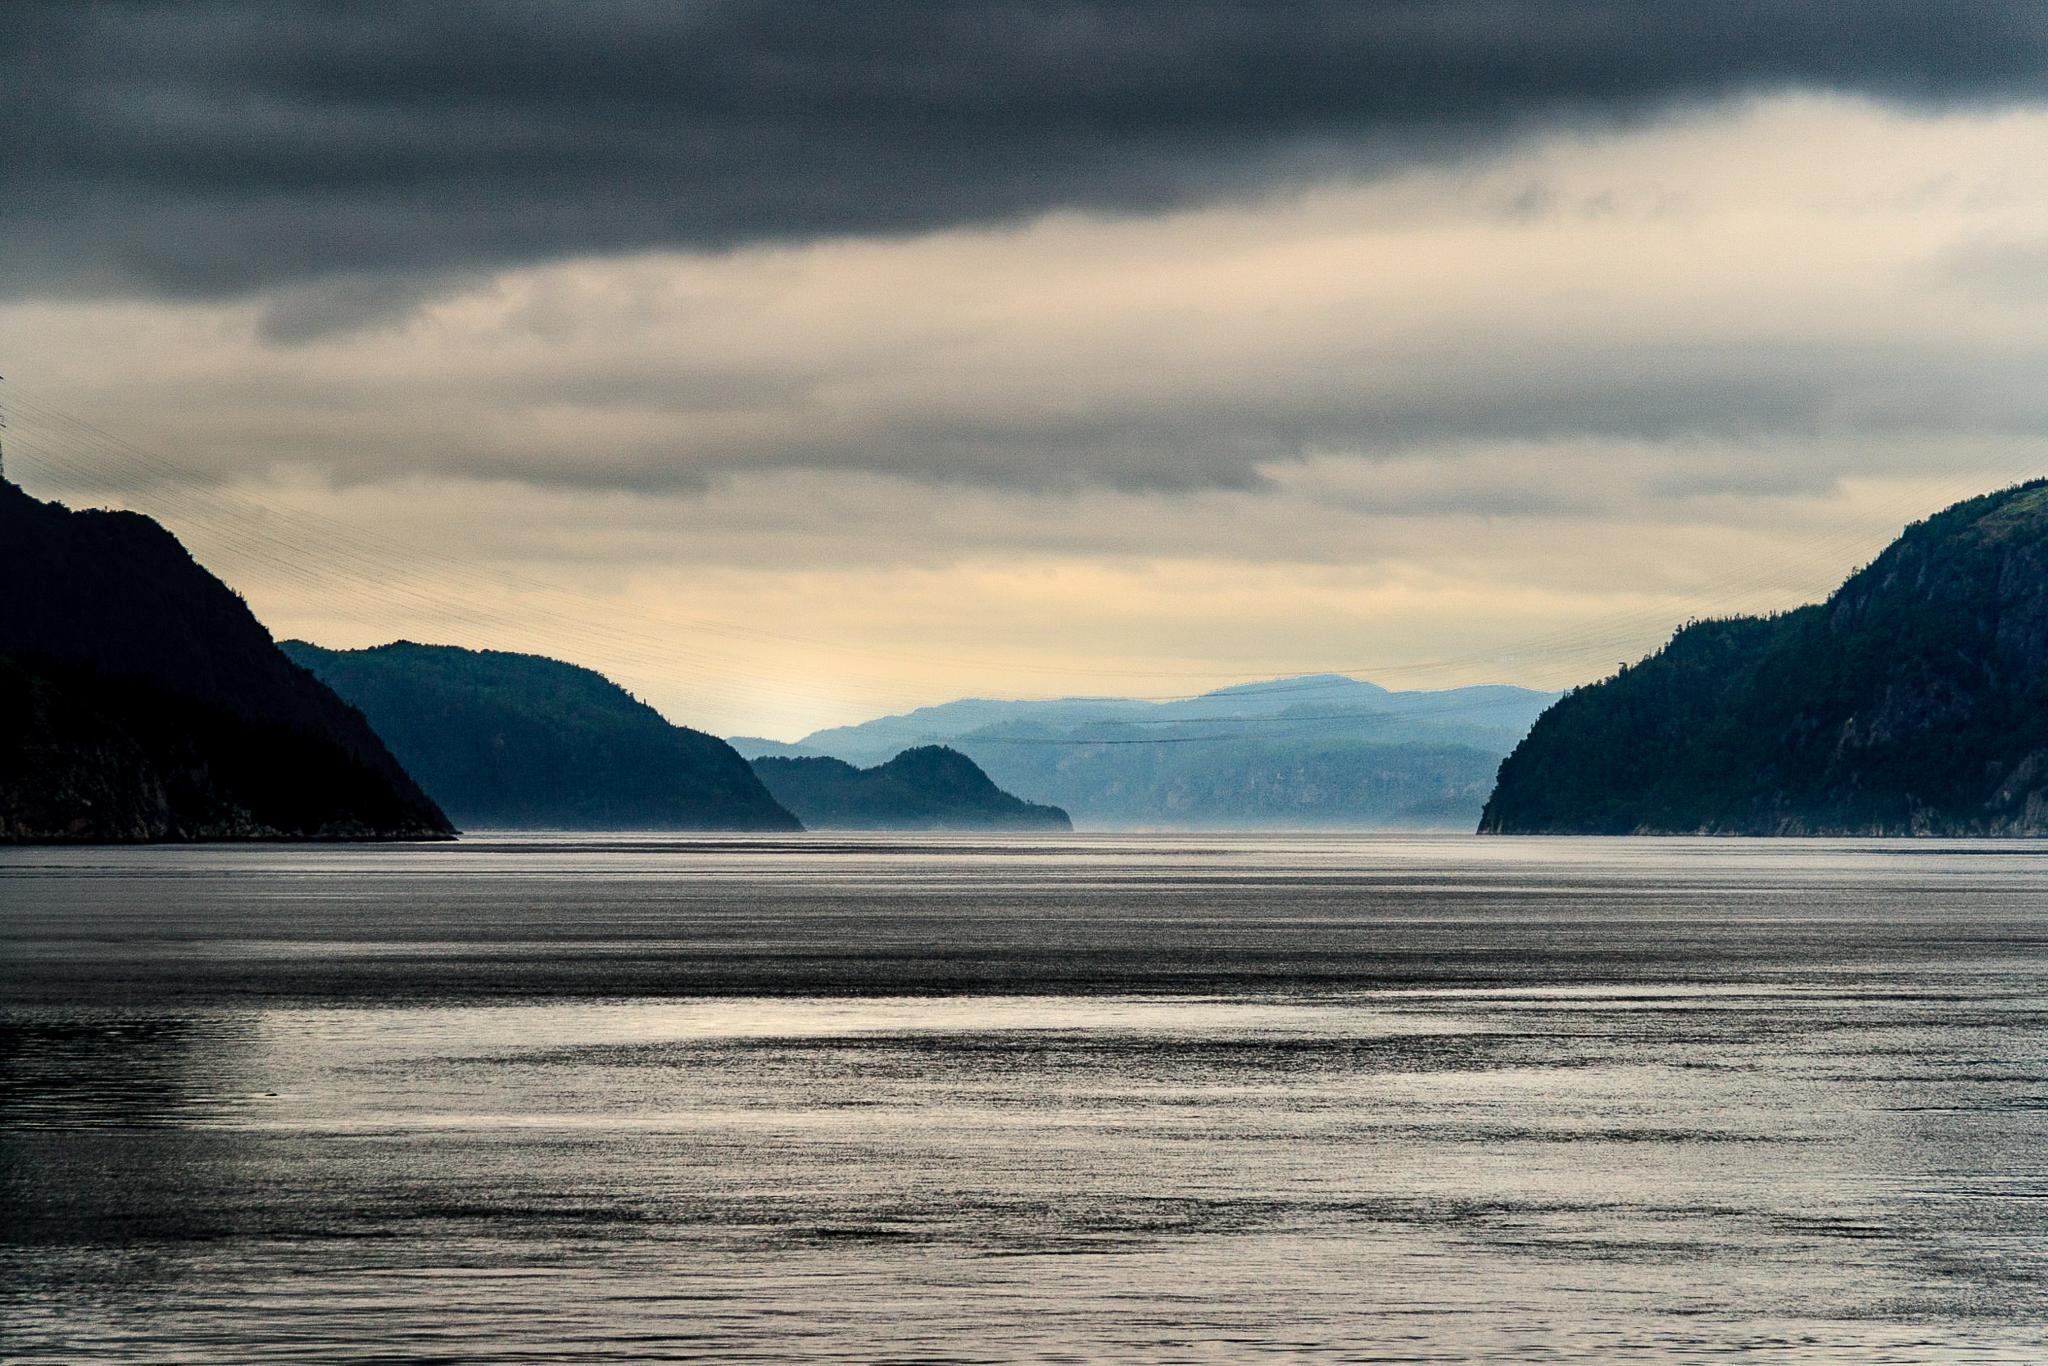 Saguenay Fjord  by stephenhops